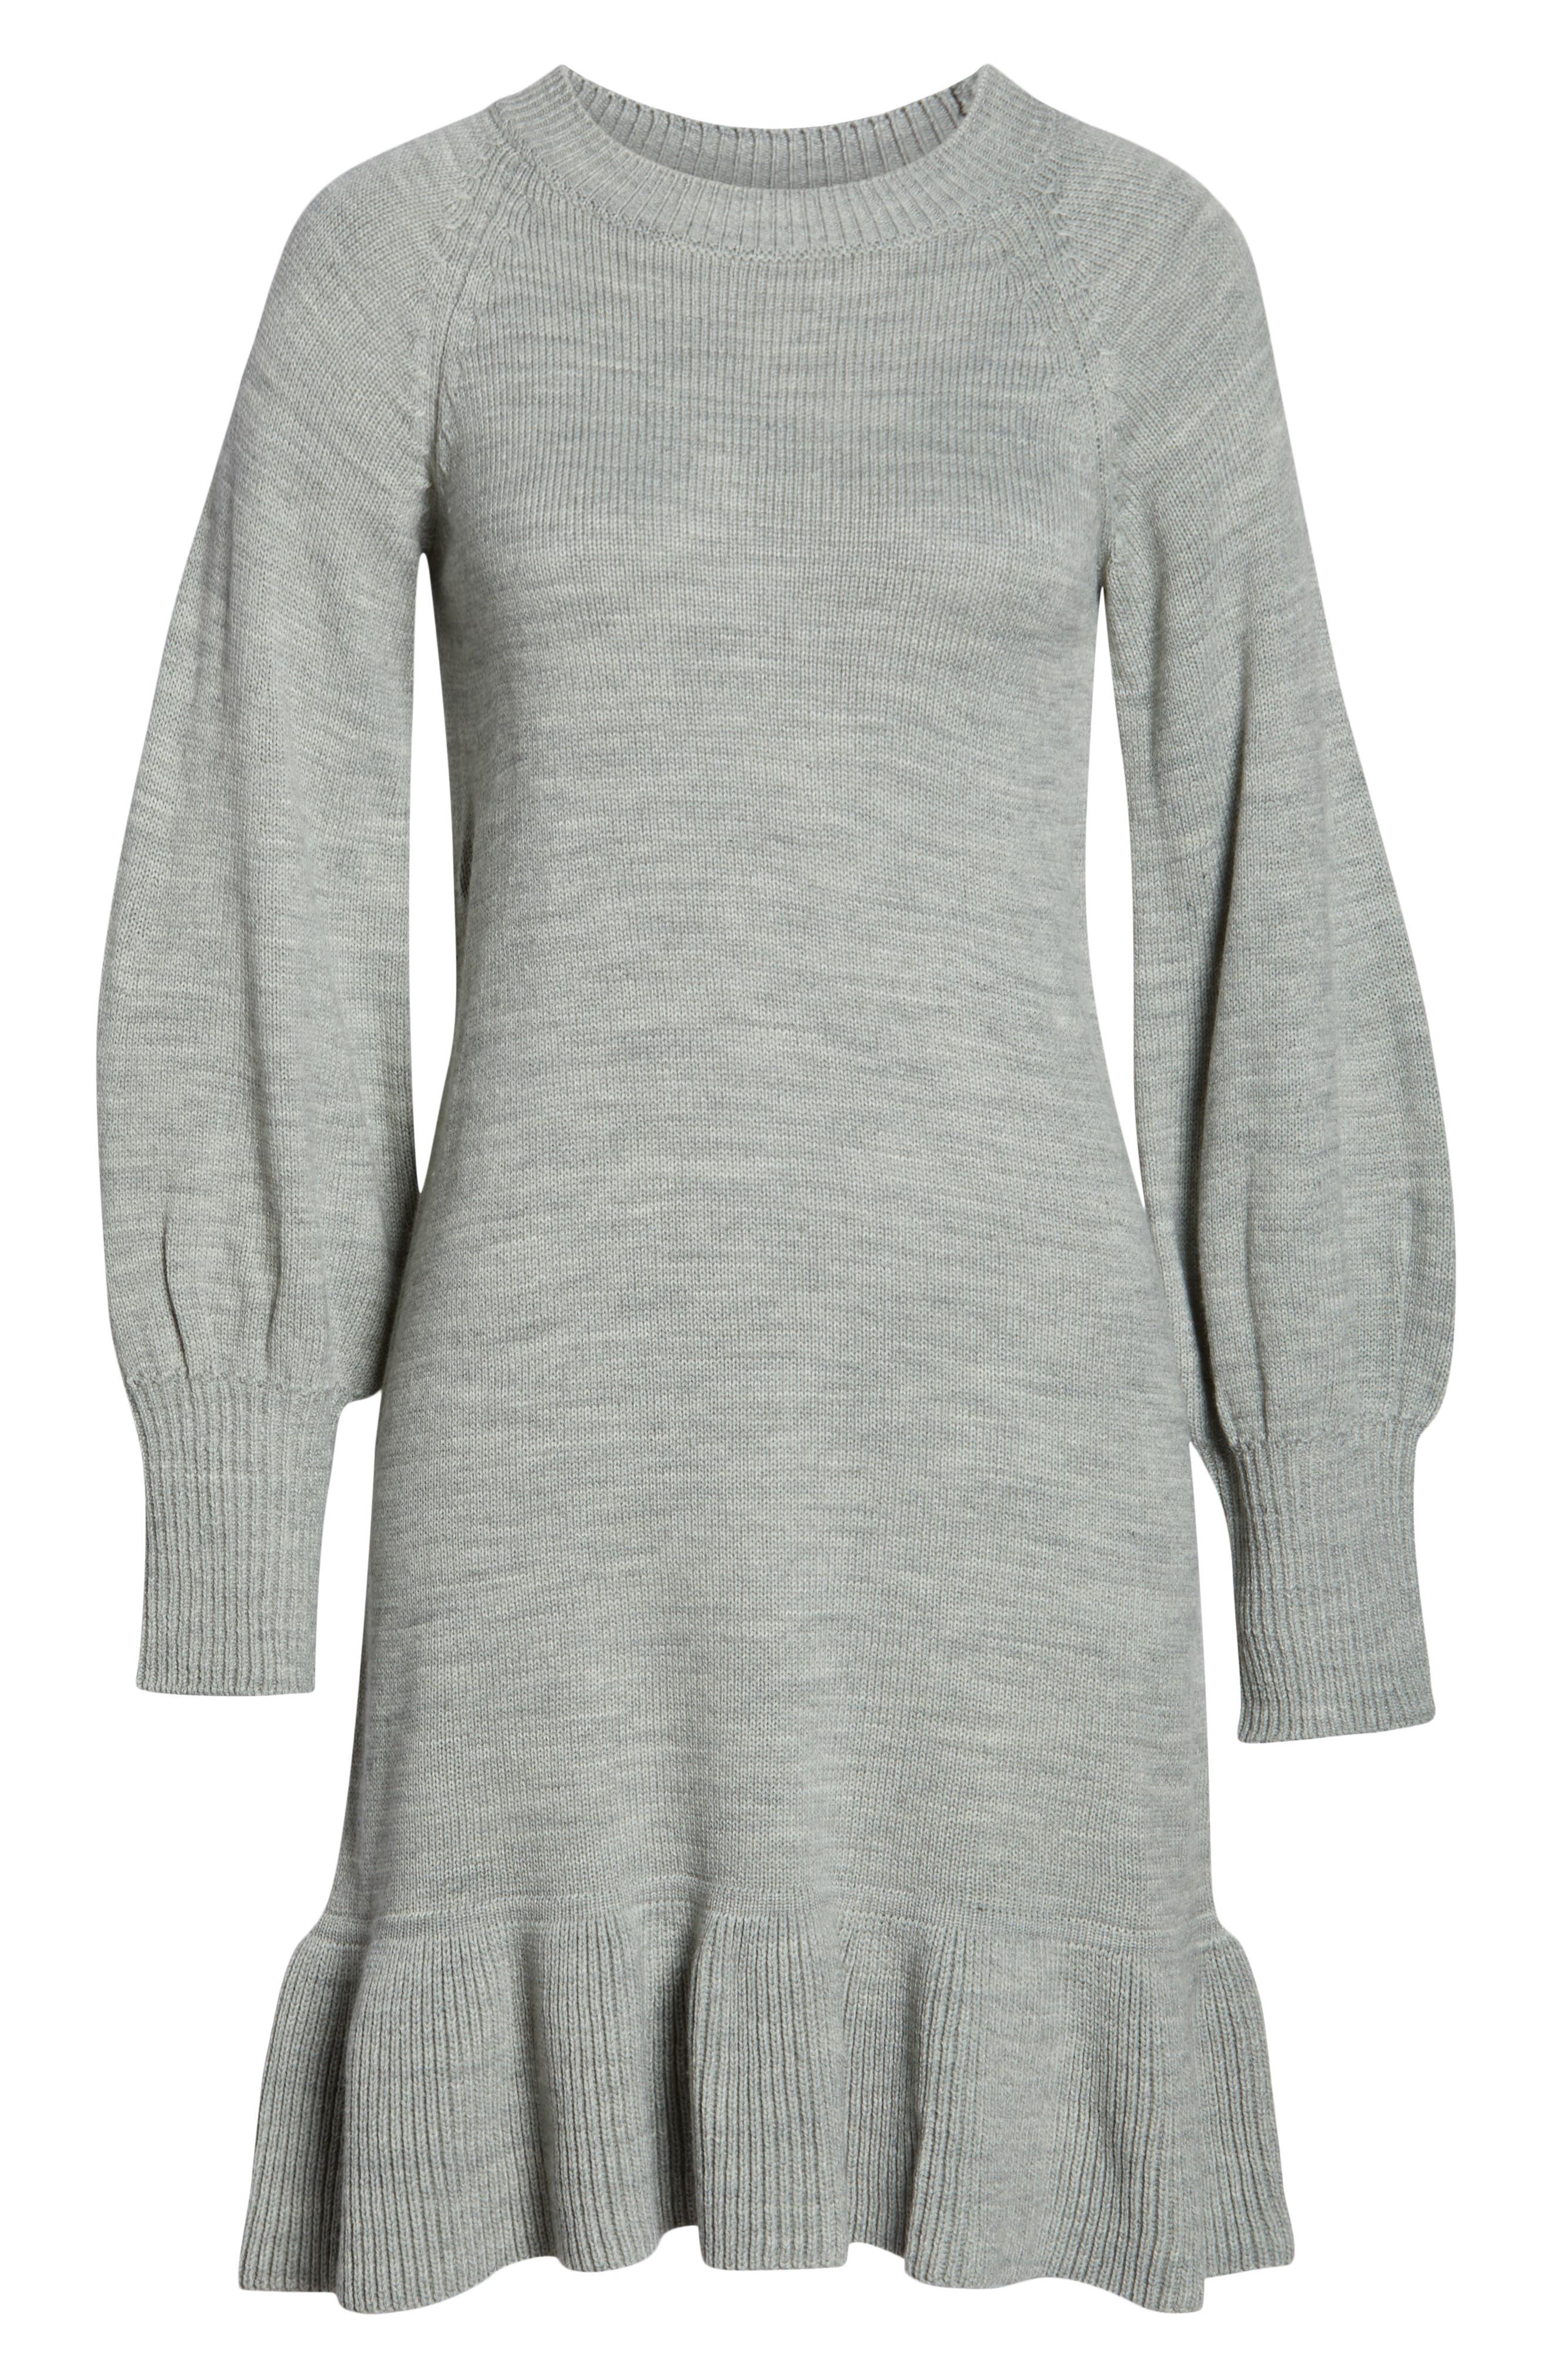 Balloon Sleeve Sweater Dress,                             Alternate thumbnail 7, color,                             GREY